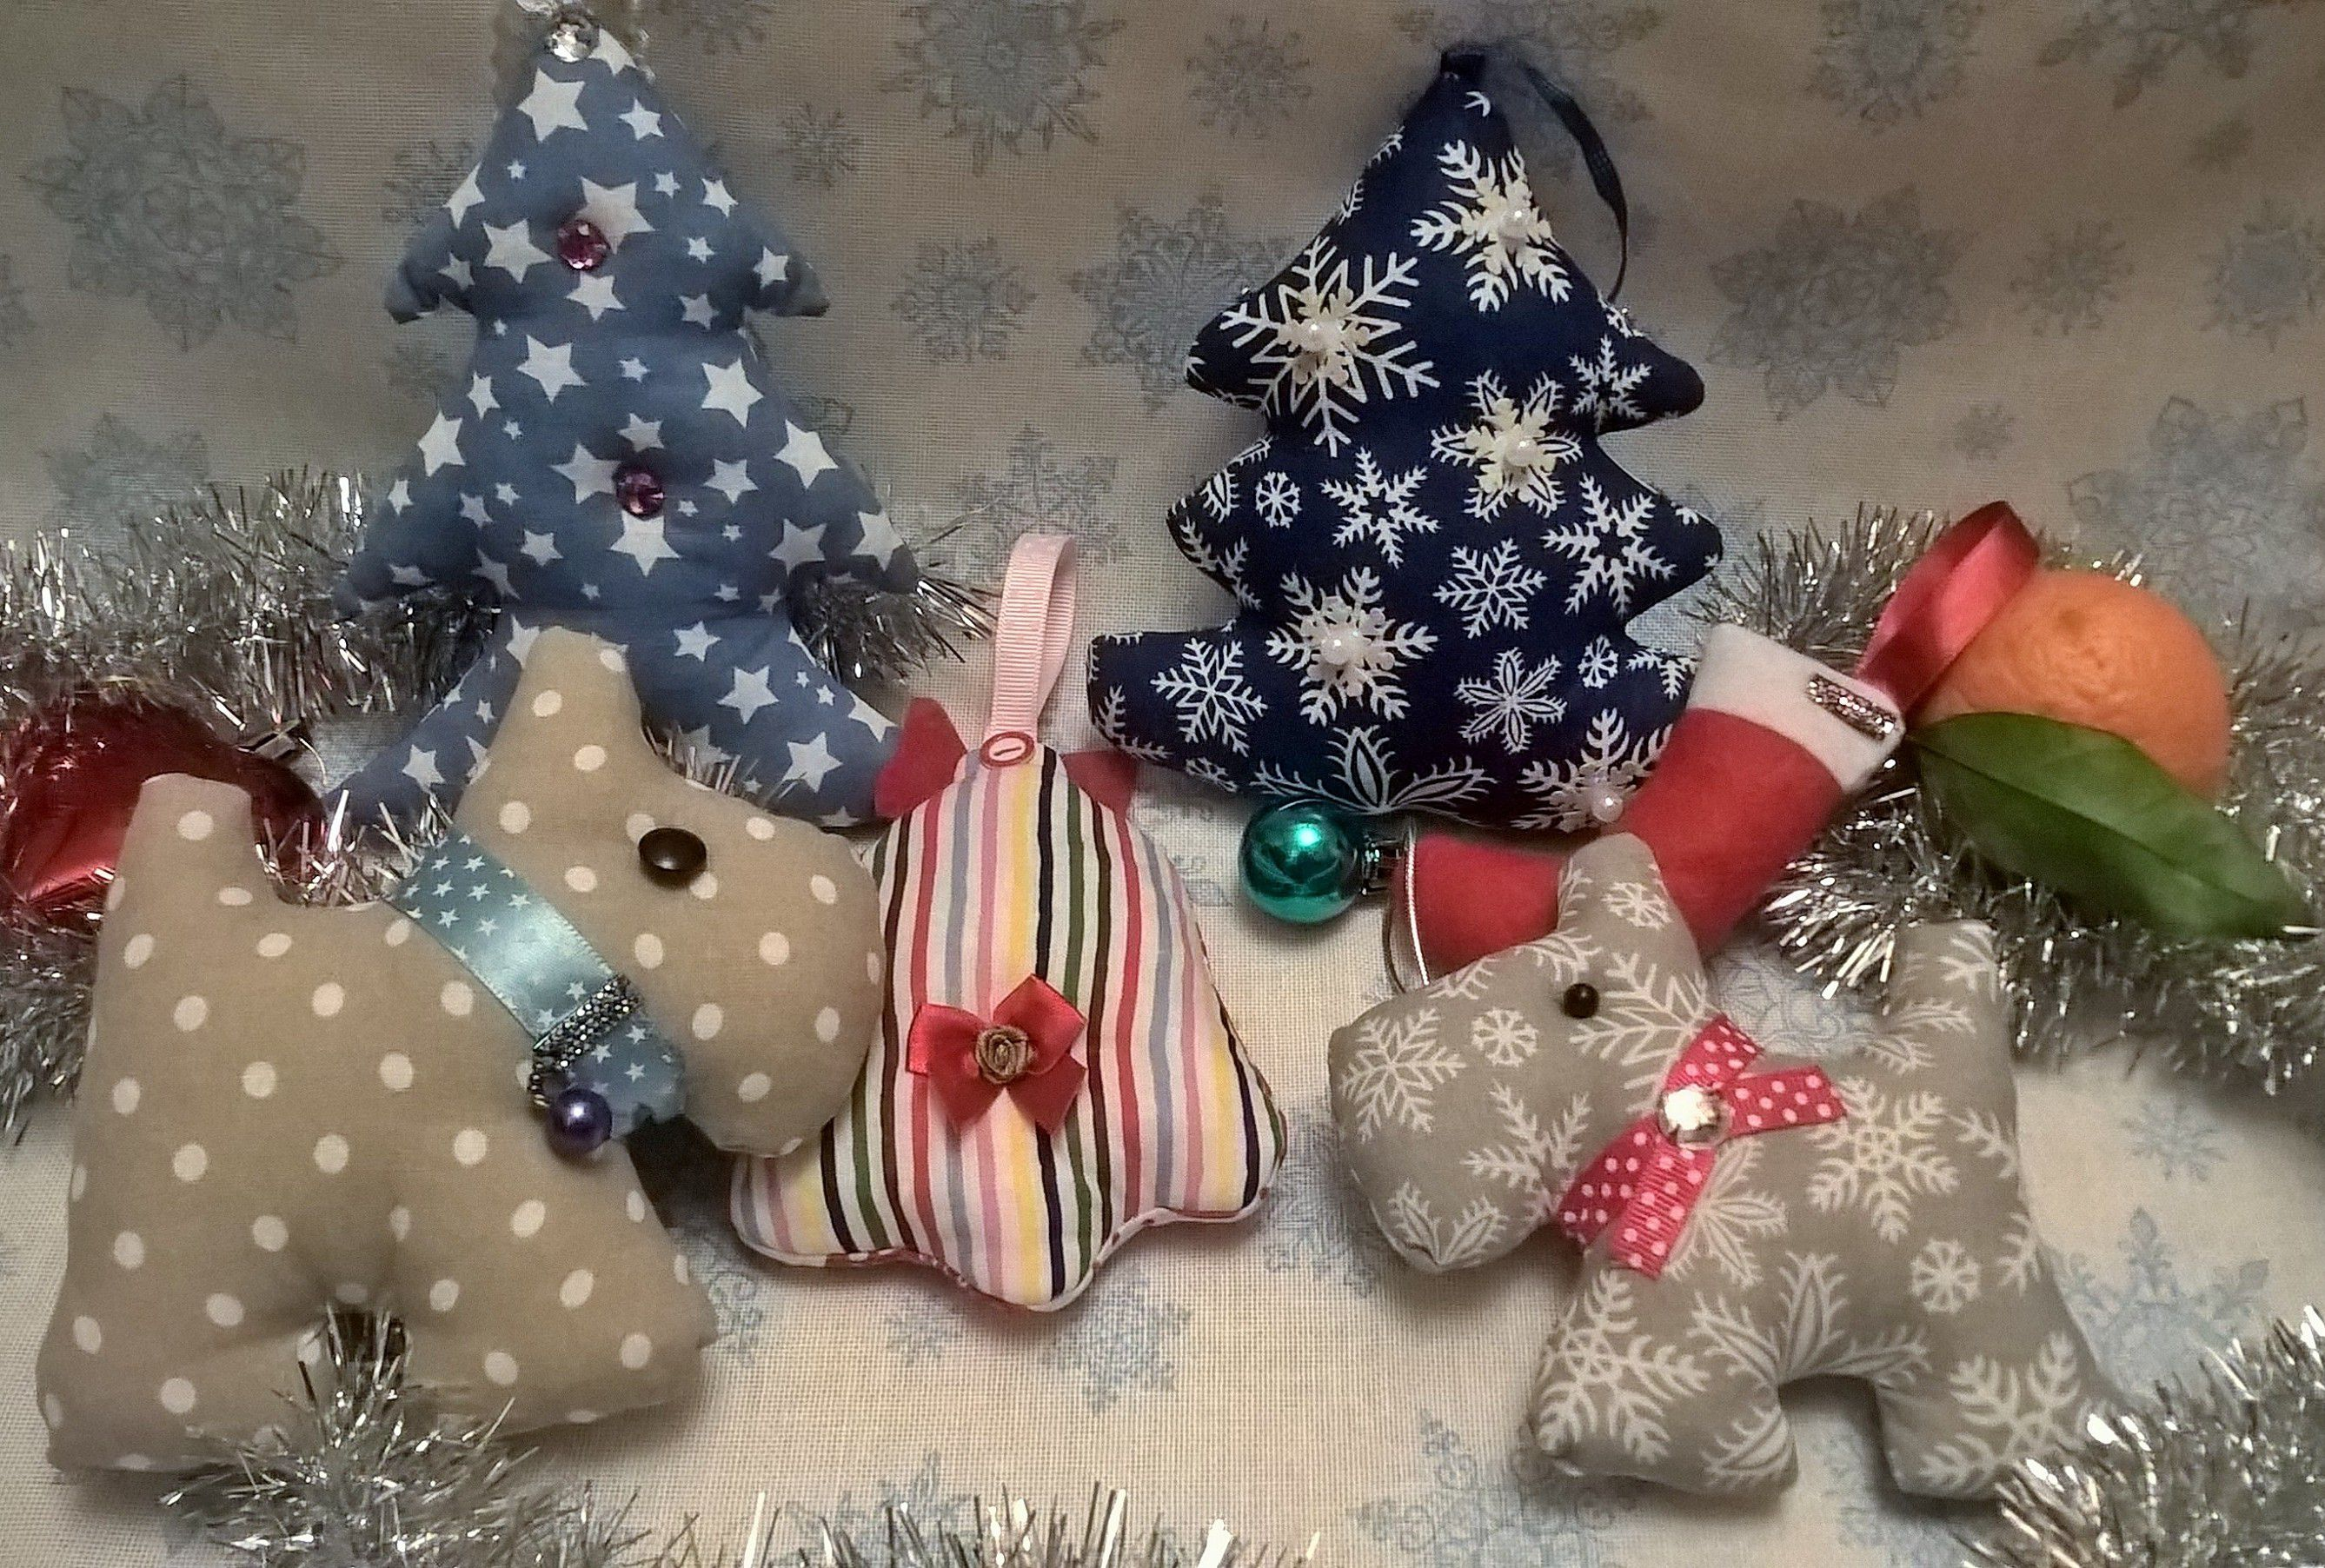 подарки елка детям новыйгод игрушки